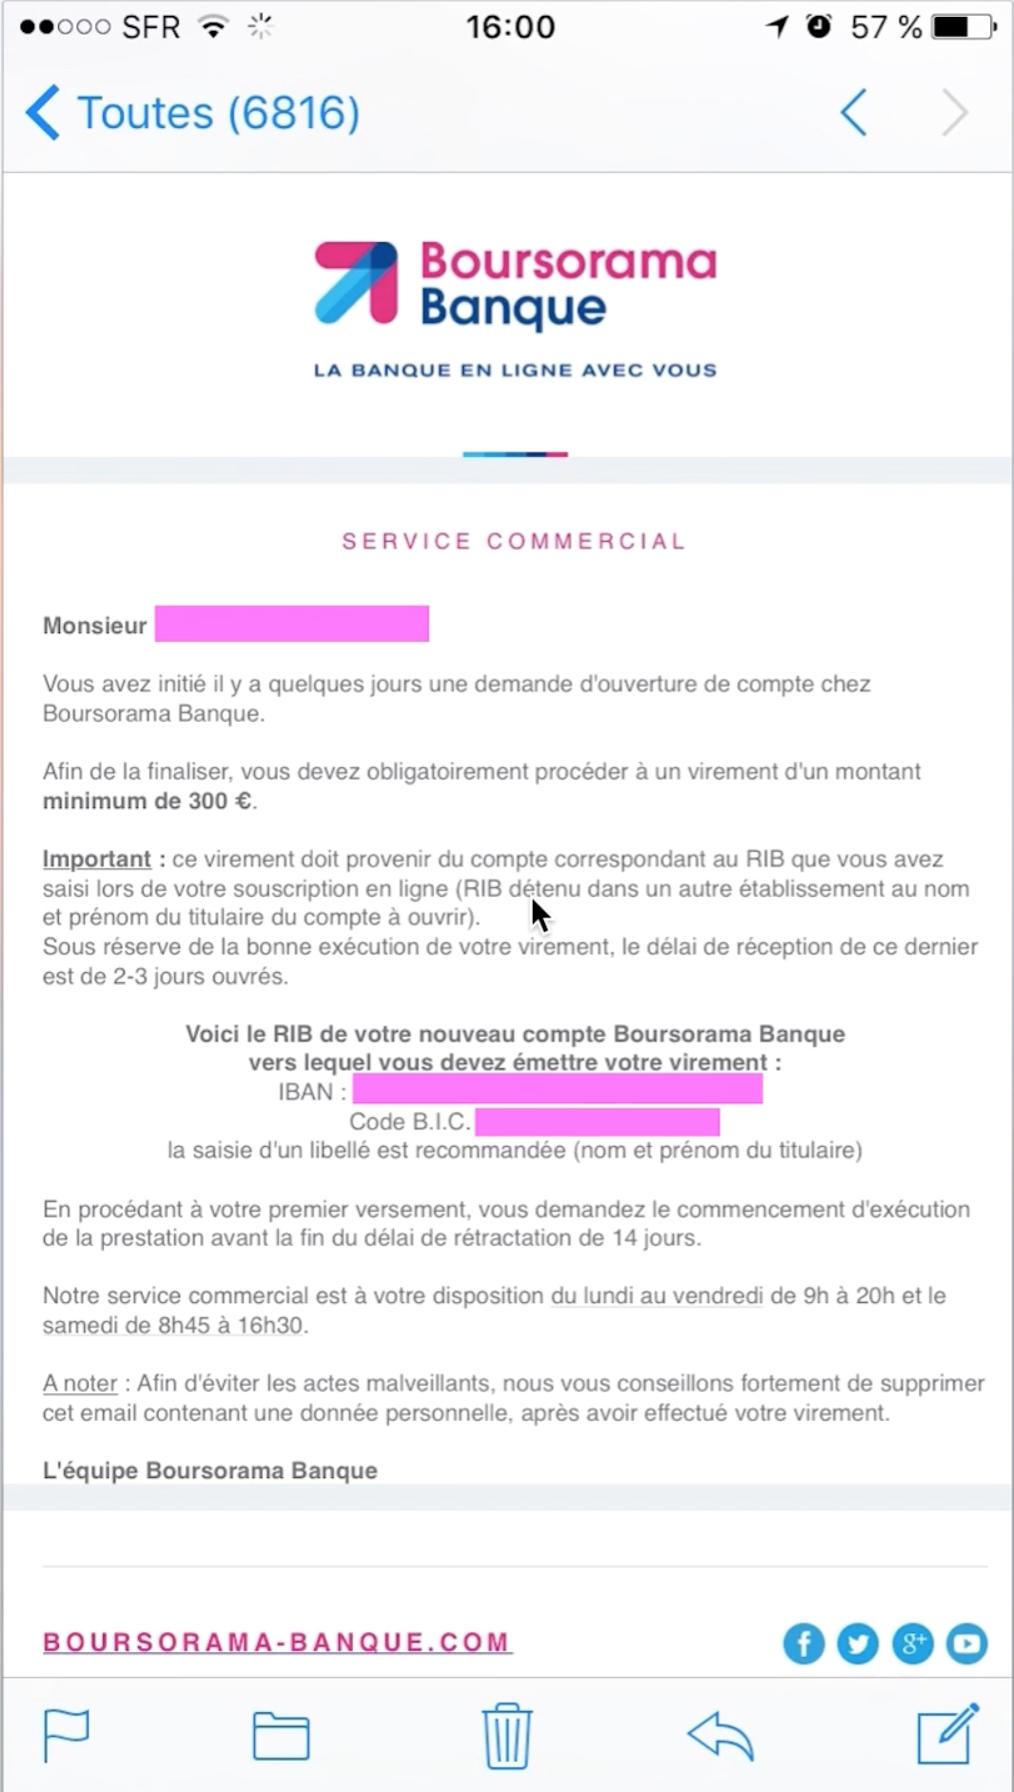 boursorama banque ouverture 300 euros